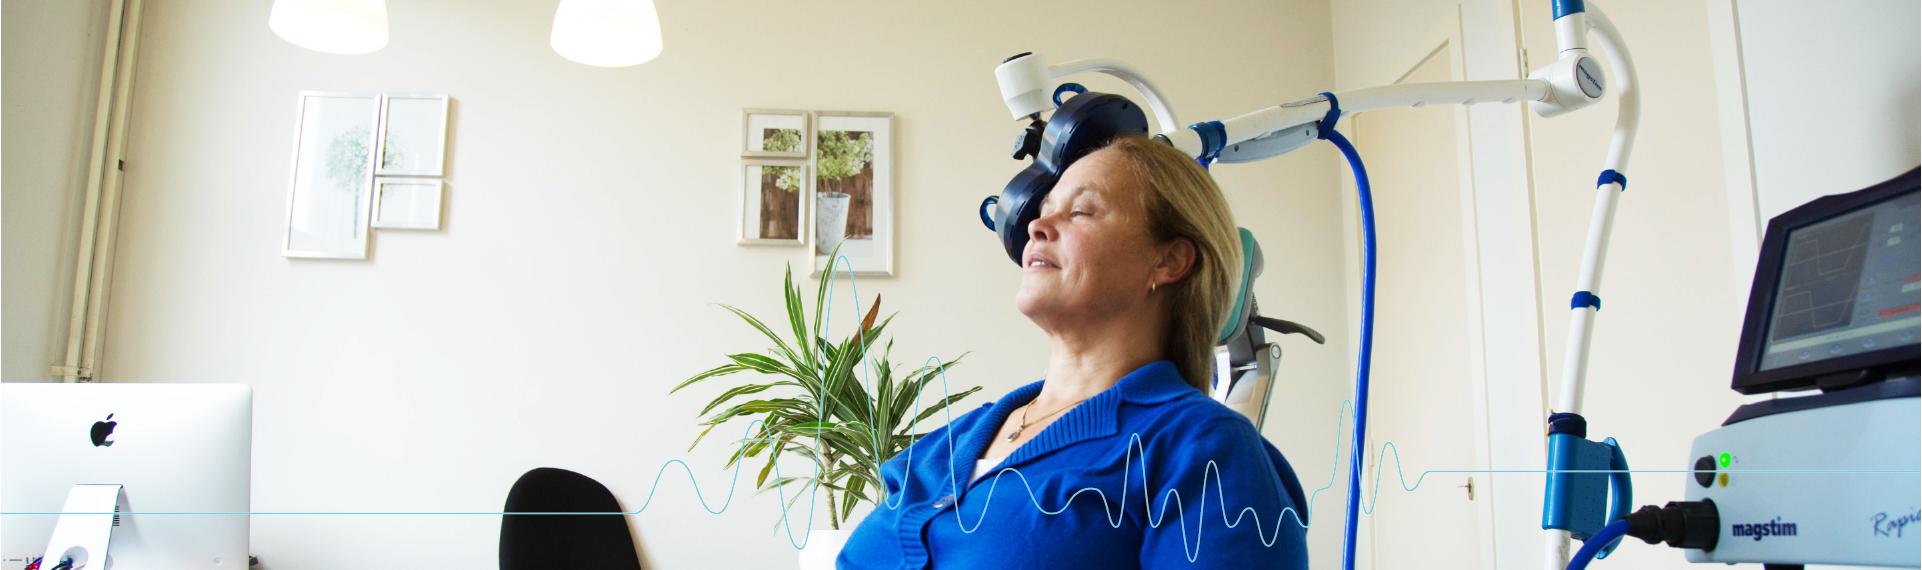 neuroCare Clinics - transcranial magnetic stimulation